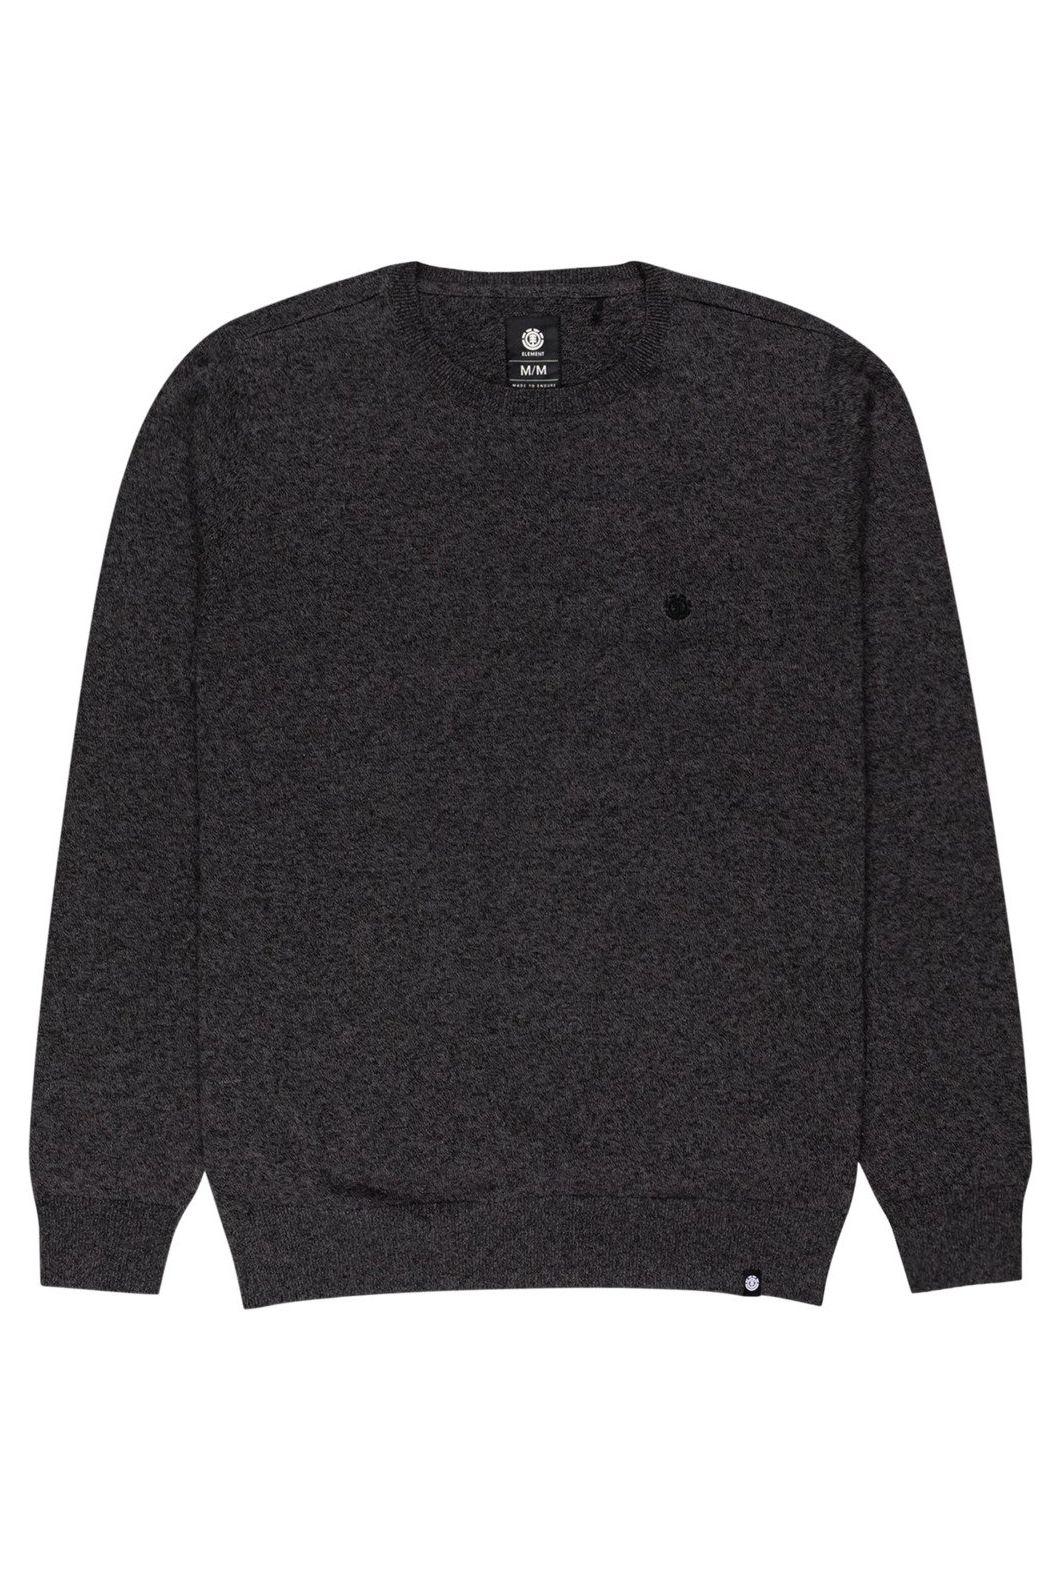 Element Sweater CREW Charcoal Heather